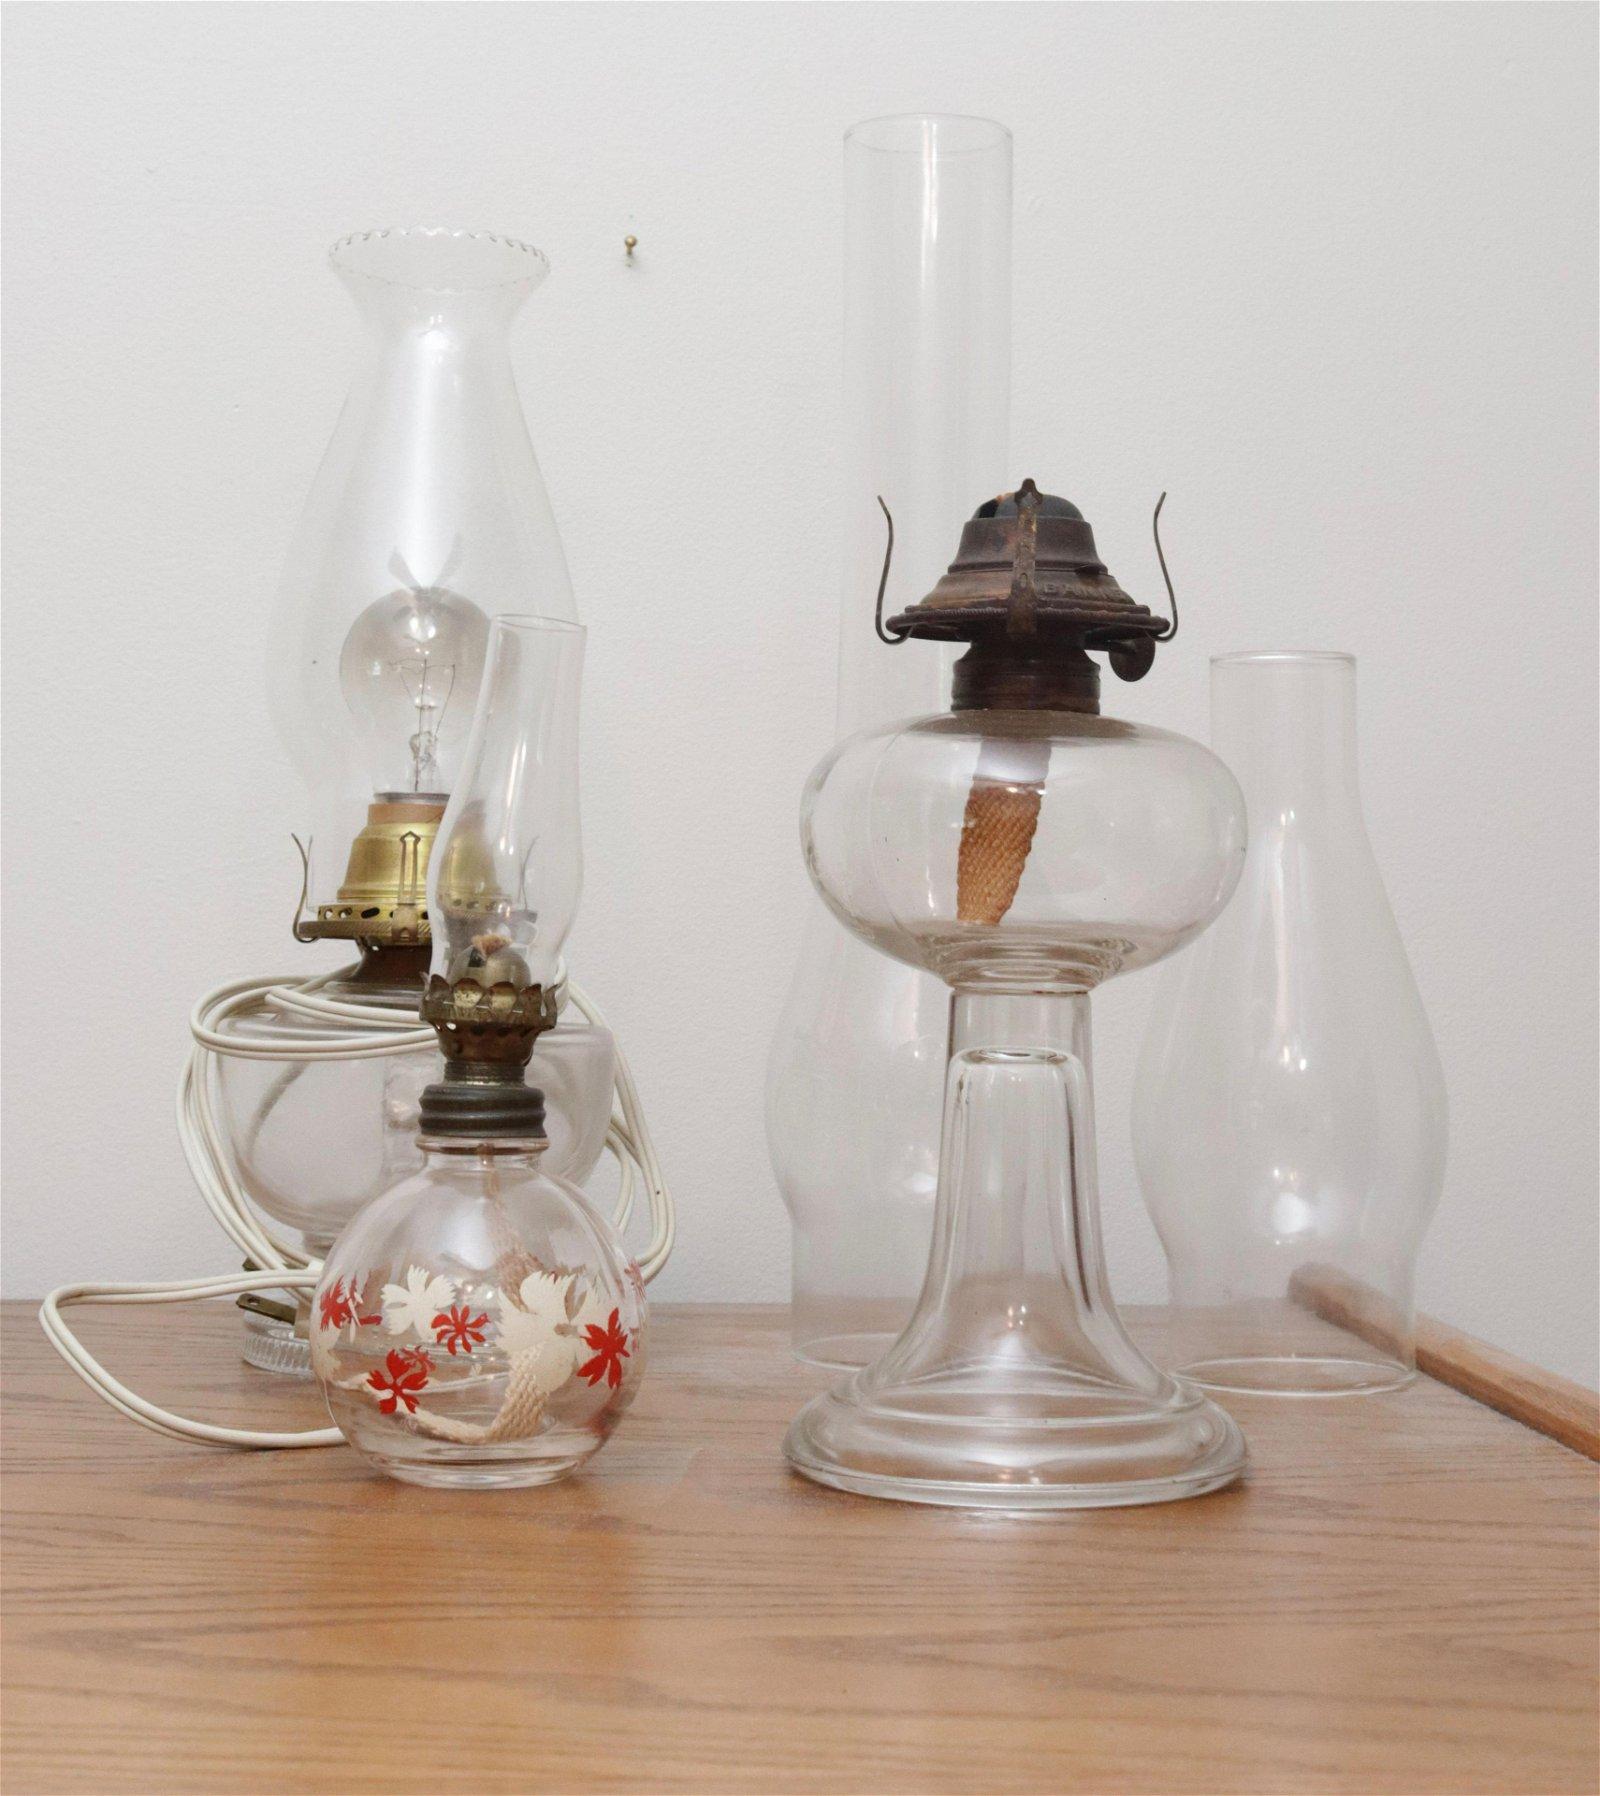 GROUP LOT OF KEROSENE LAMPS